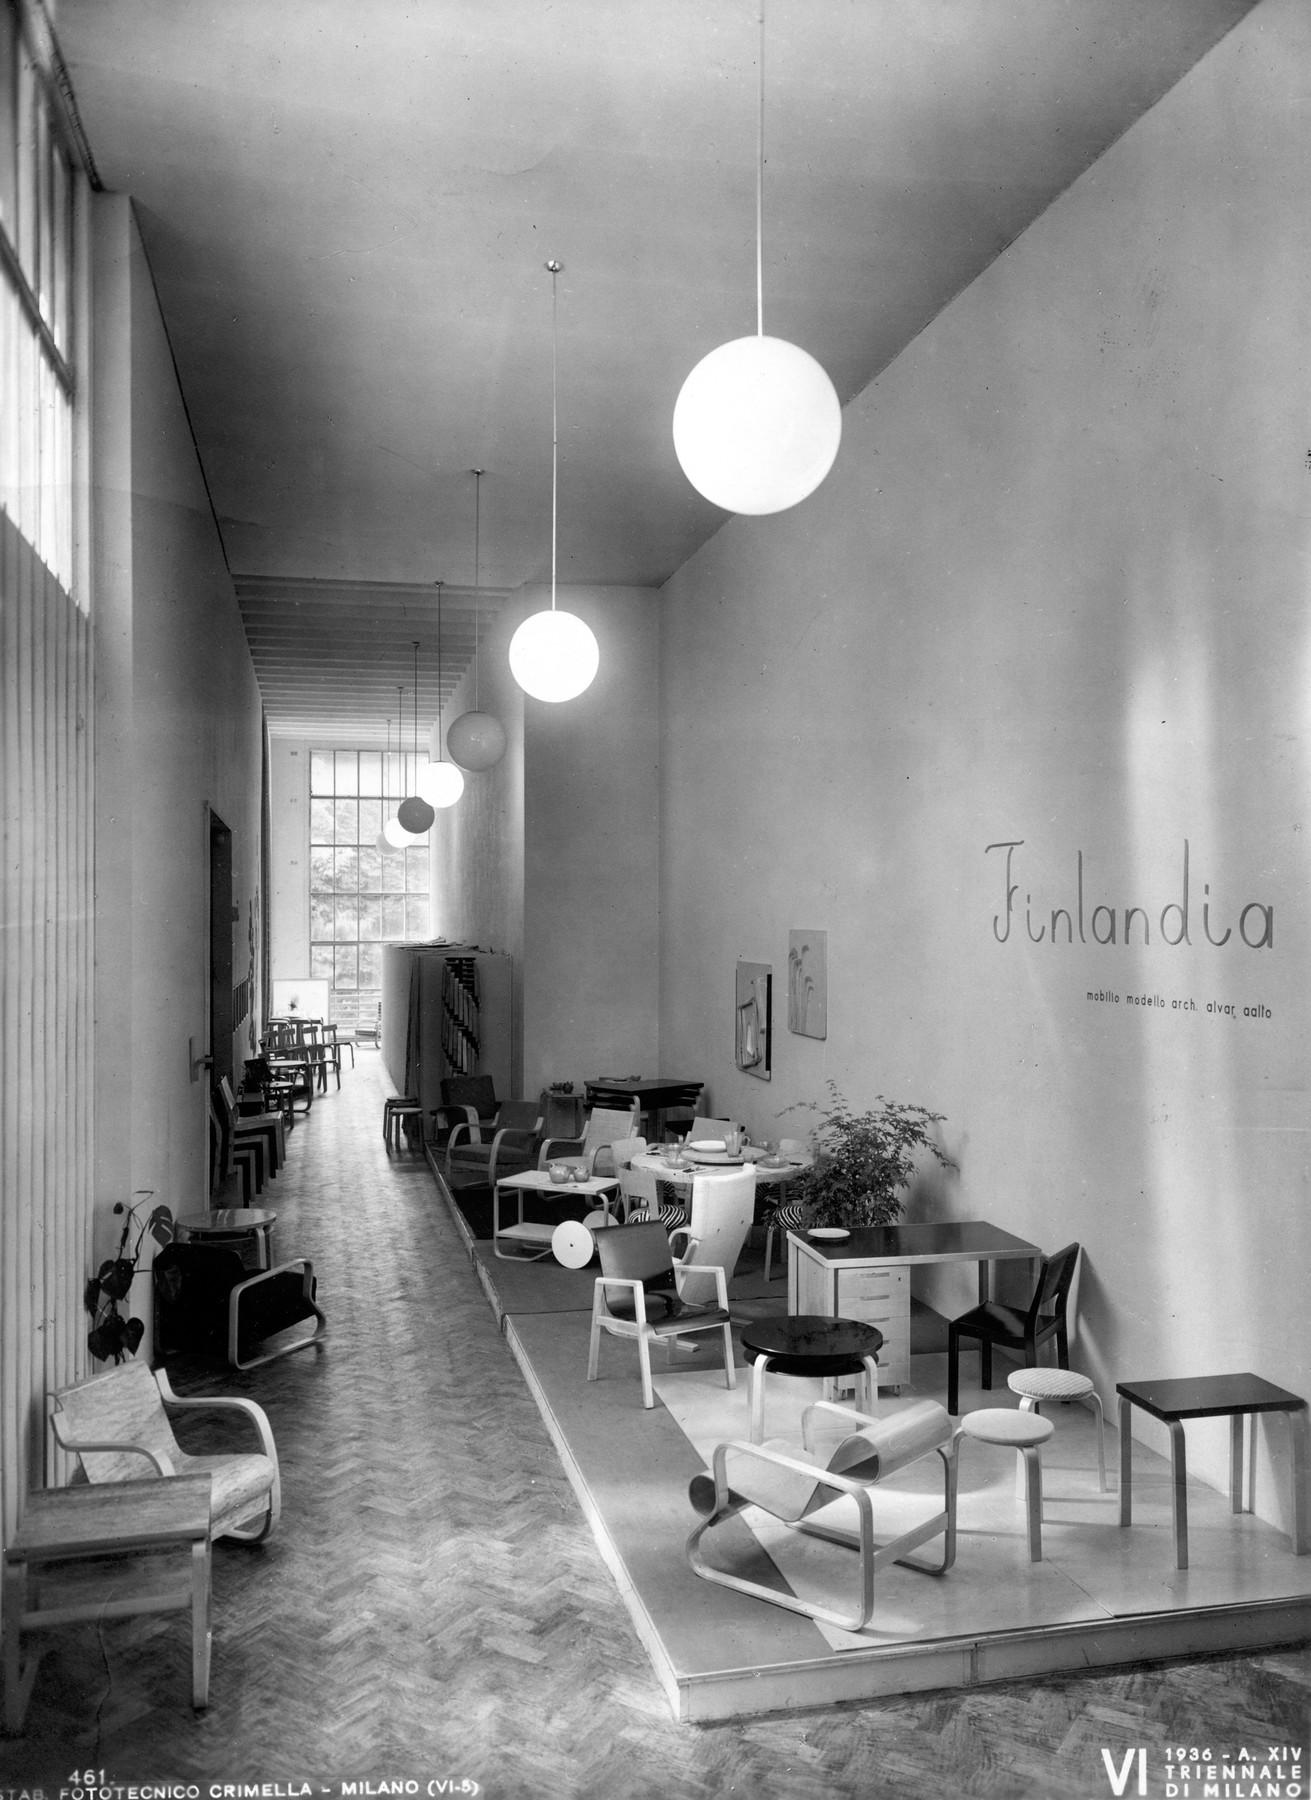 1961085 Artek Milano Triennale 1936 master